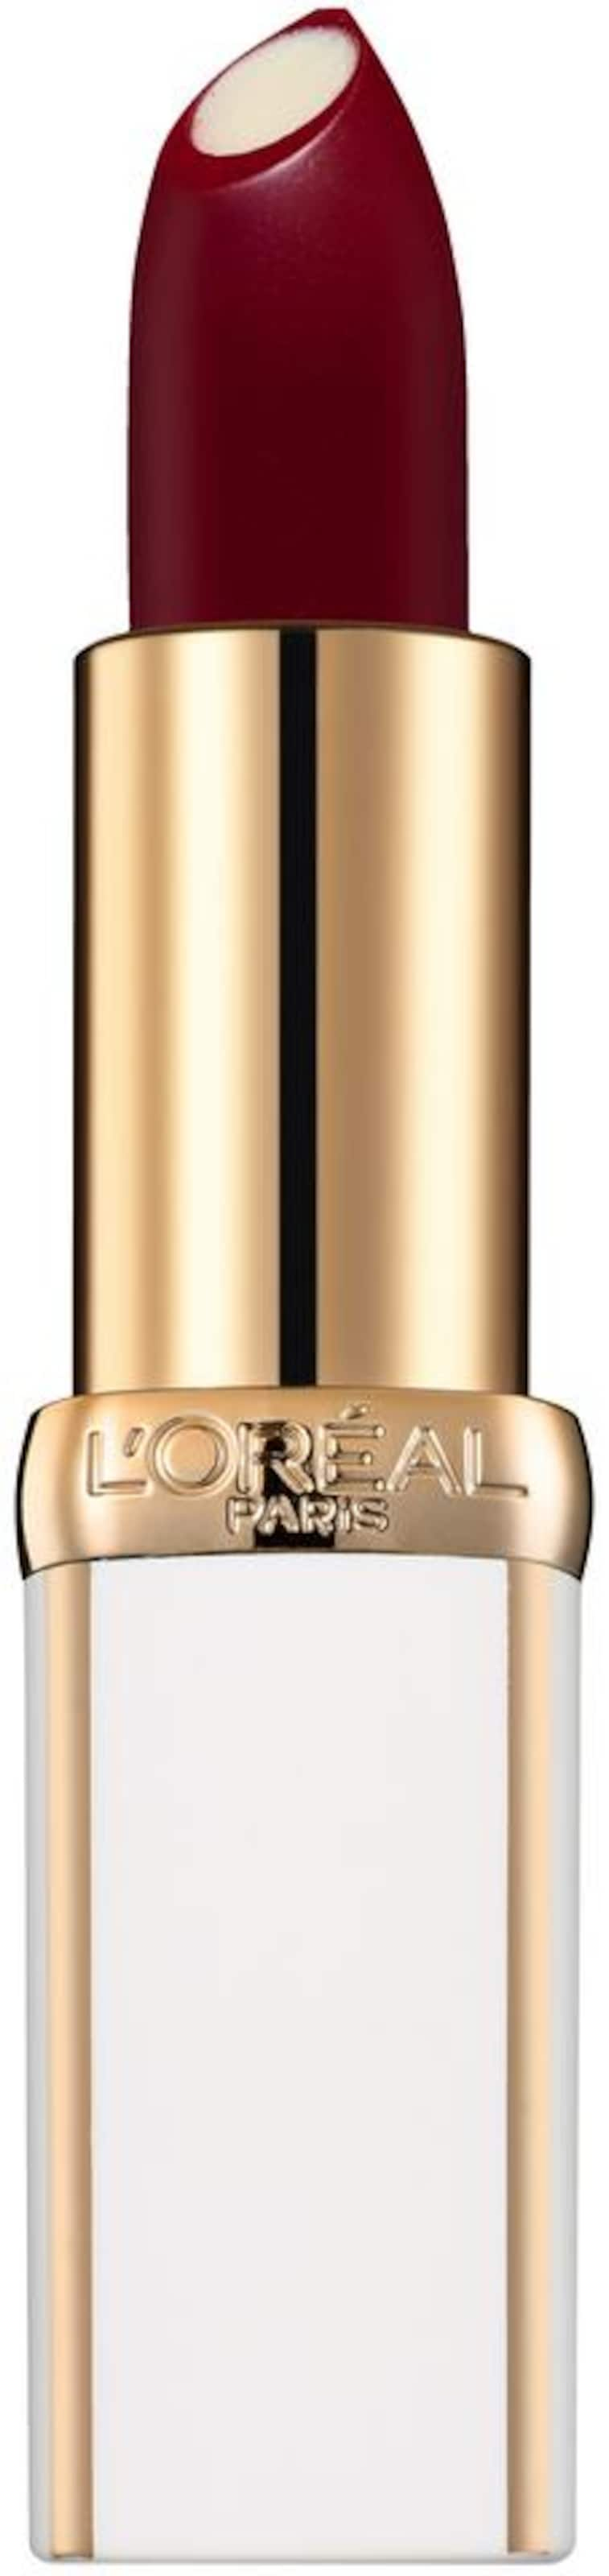 WeinrotWeiß Helen L'oréal 'age Perfect In Geschenkset Mirrens' Paris ID9WH2E